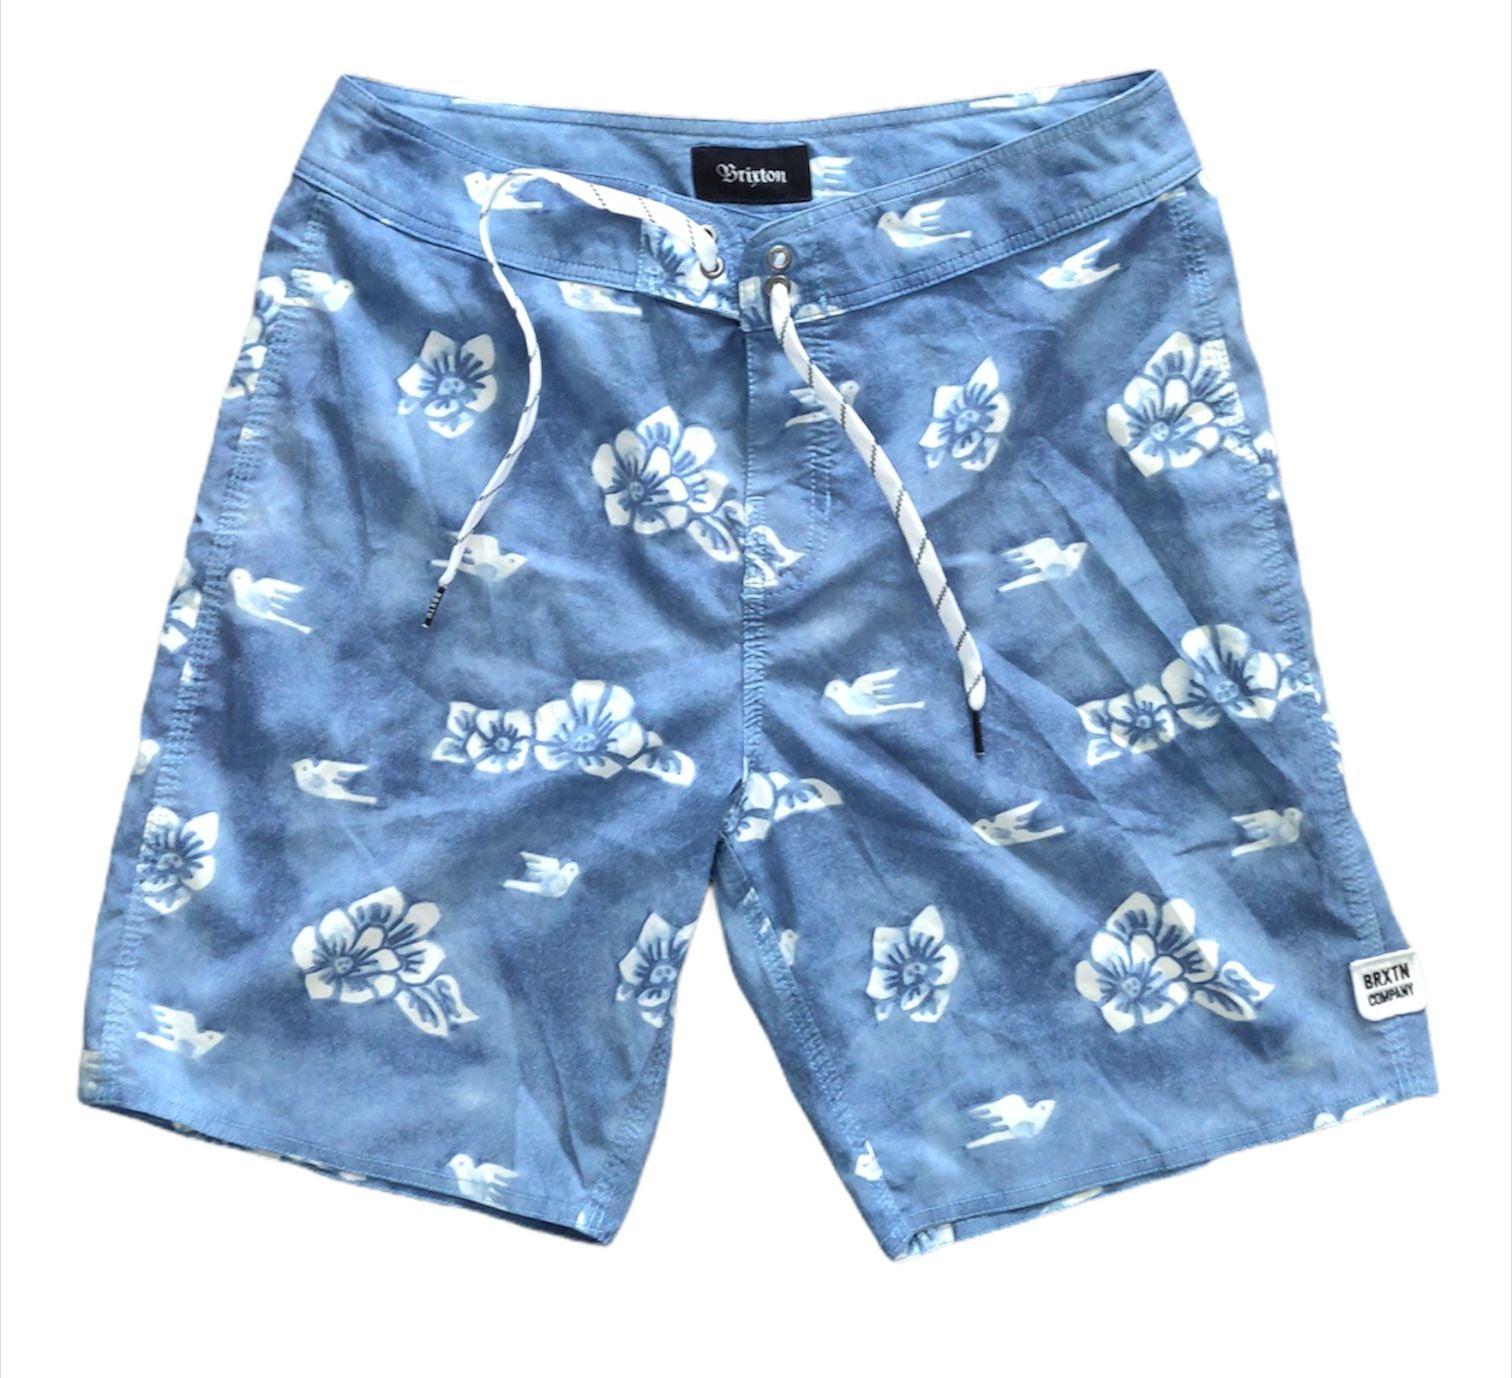 Brixton Board Shorts